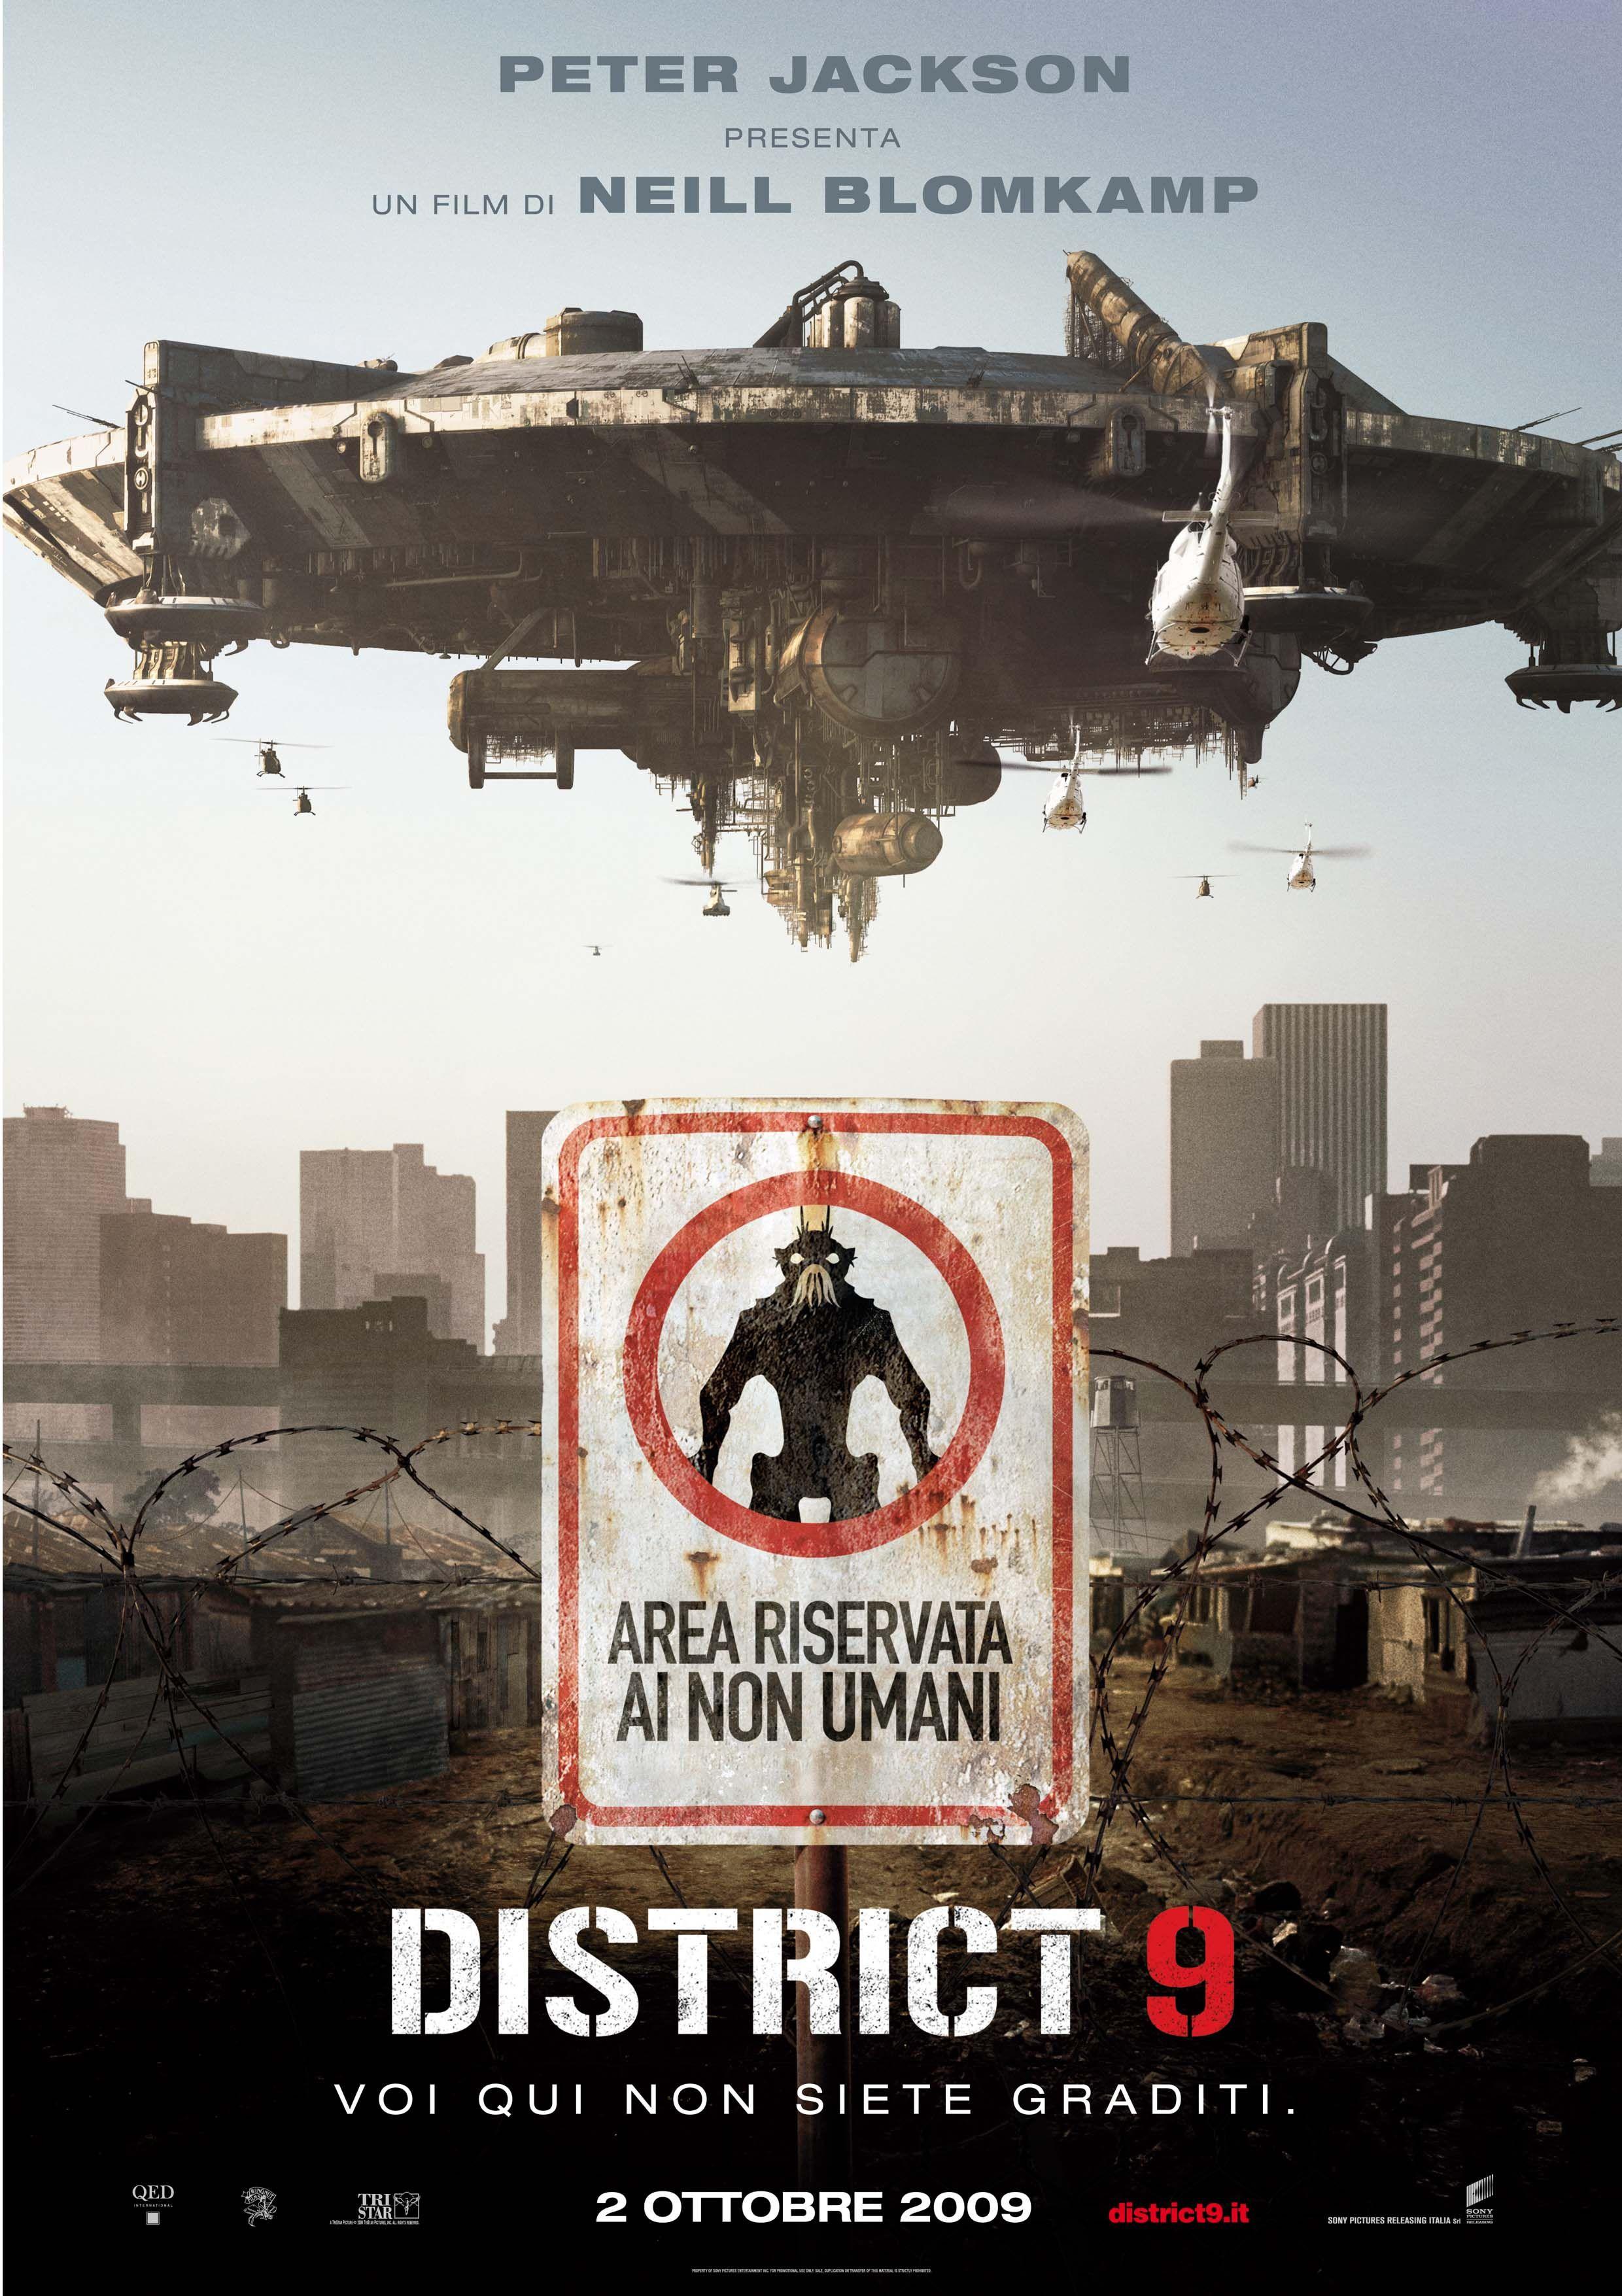 District 9 - Peter Jackson presents a film by Neill Blomkamp